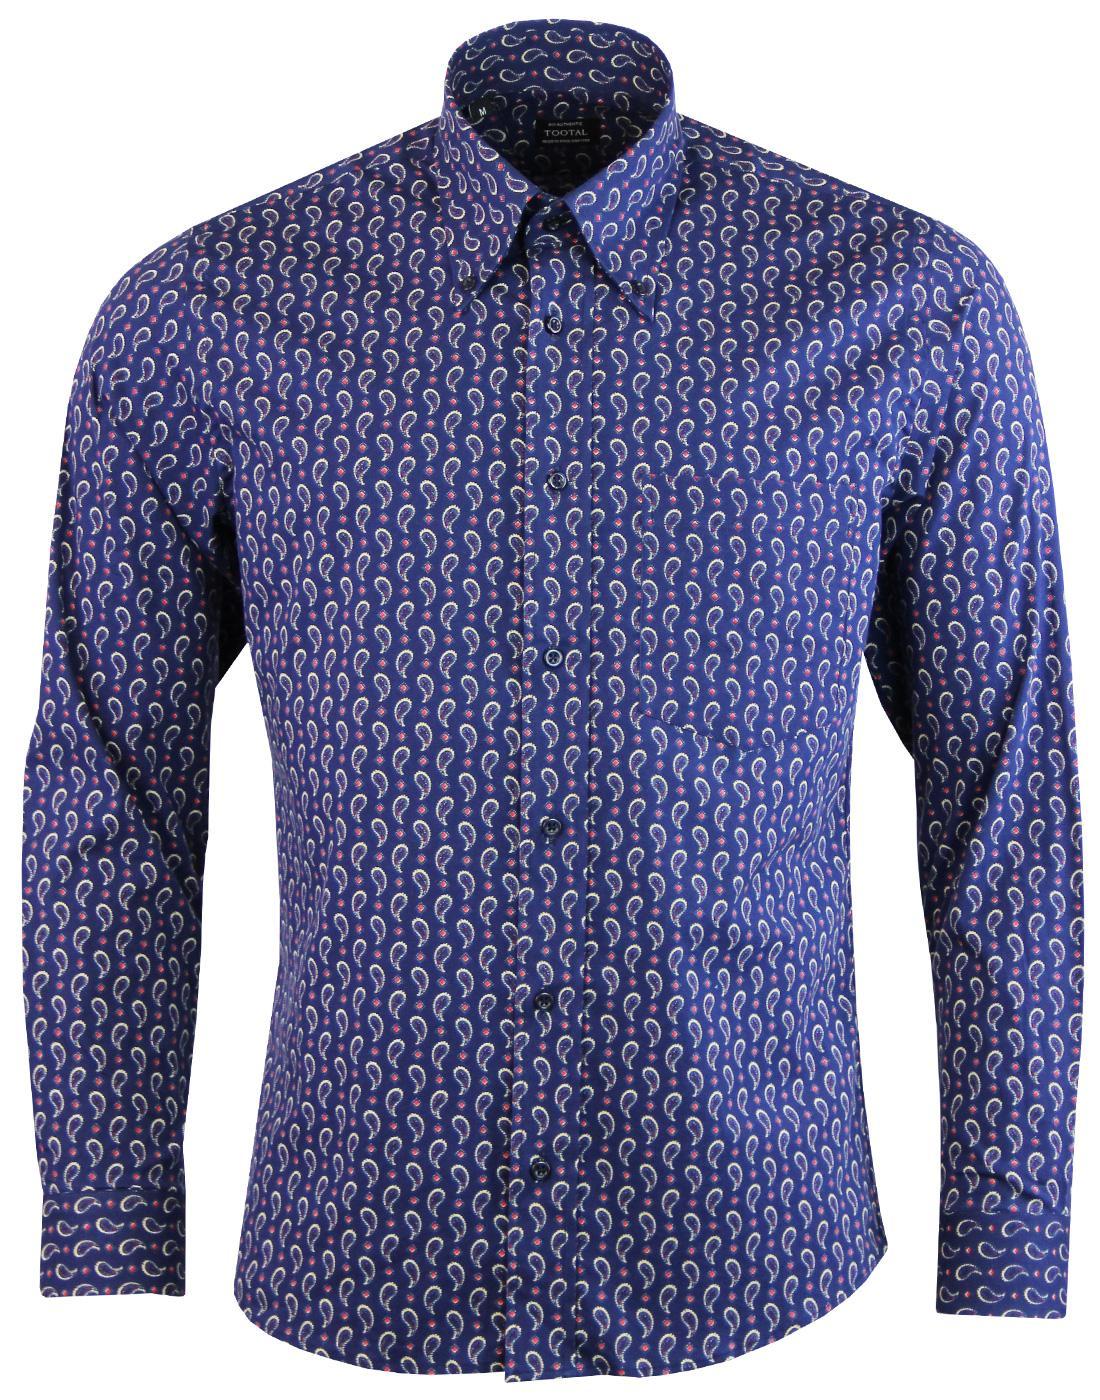 TOOTAL Retro 1960s Mod Paisley Button Down Shirt